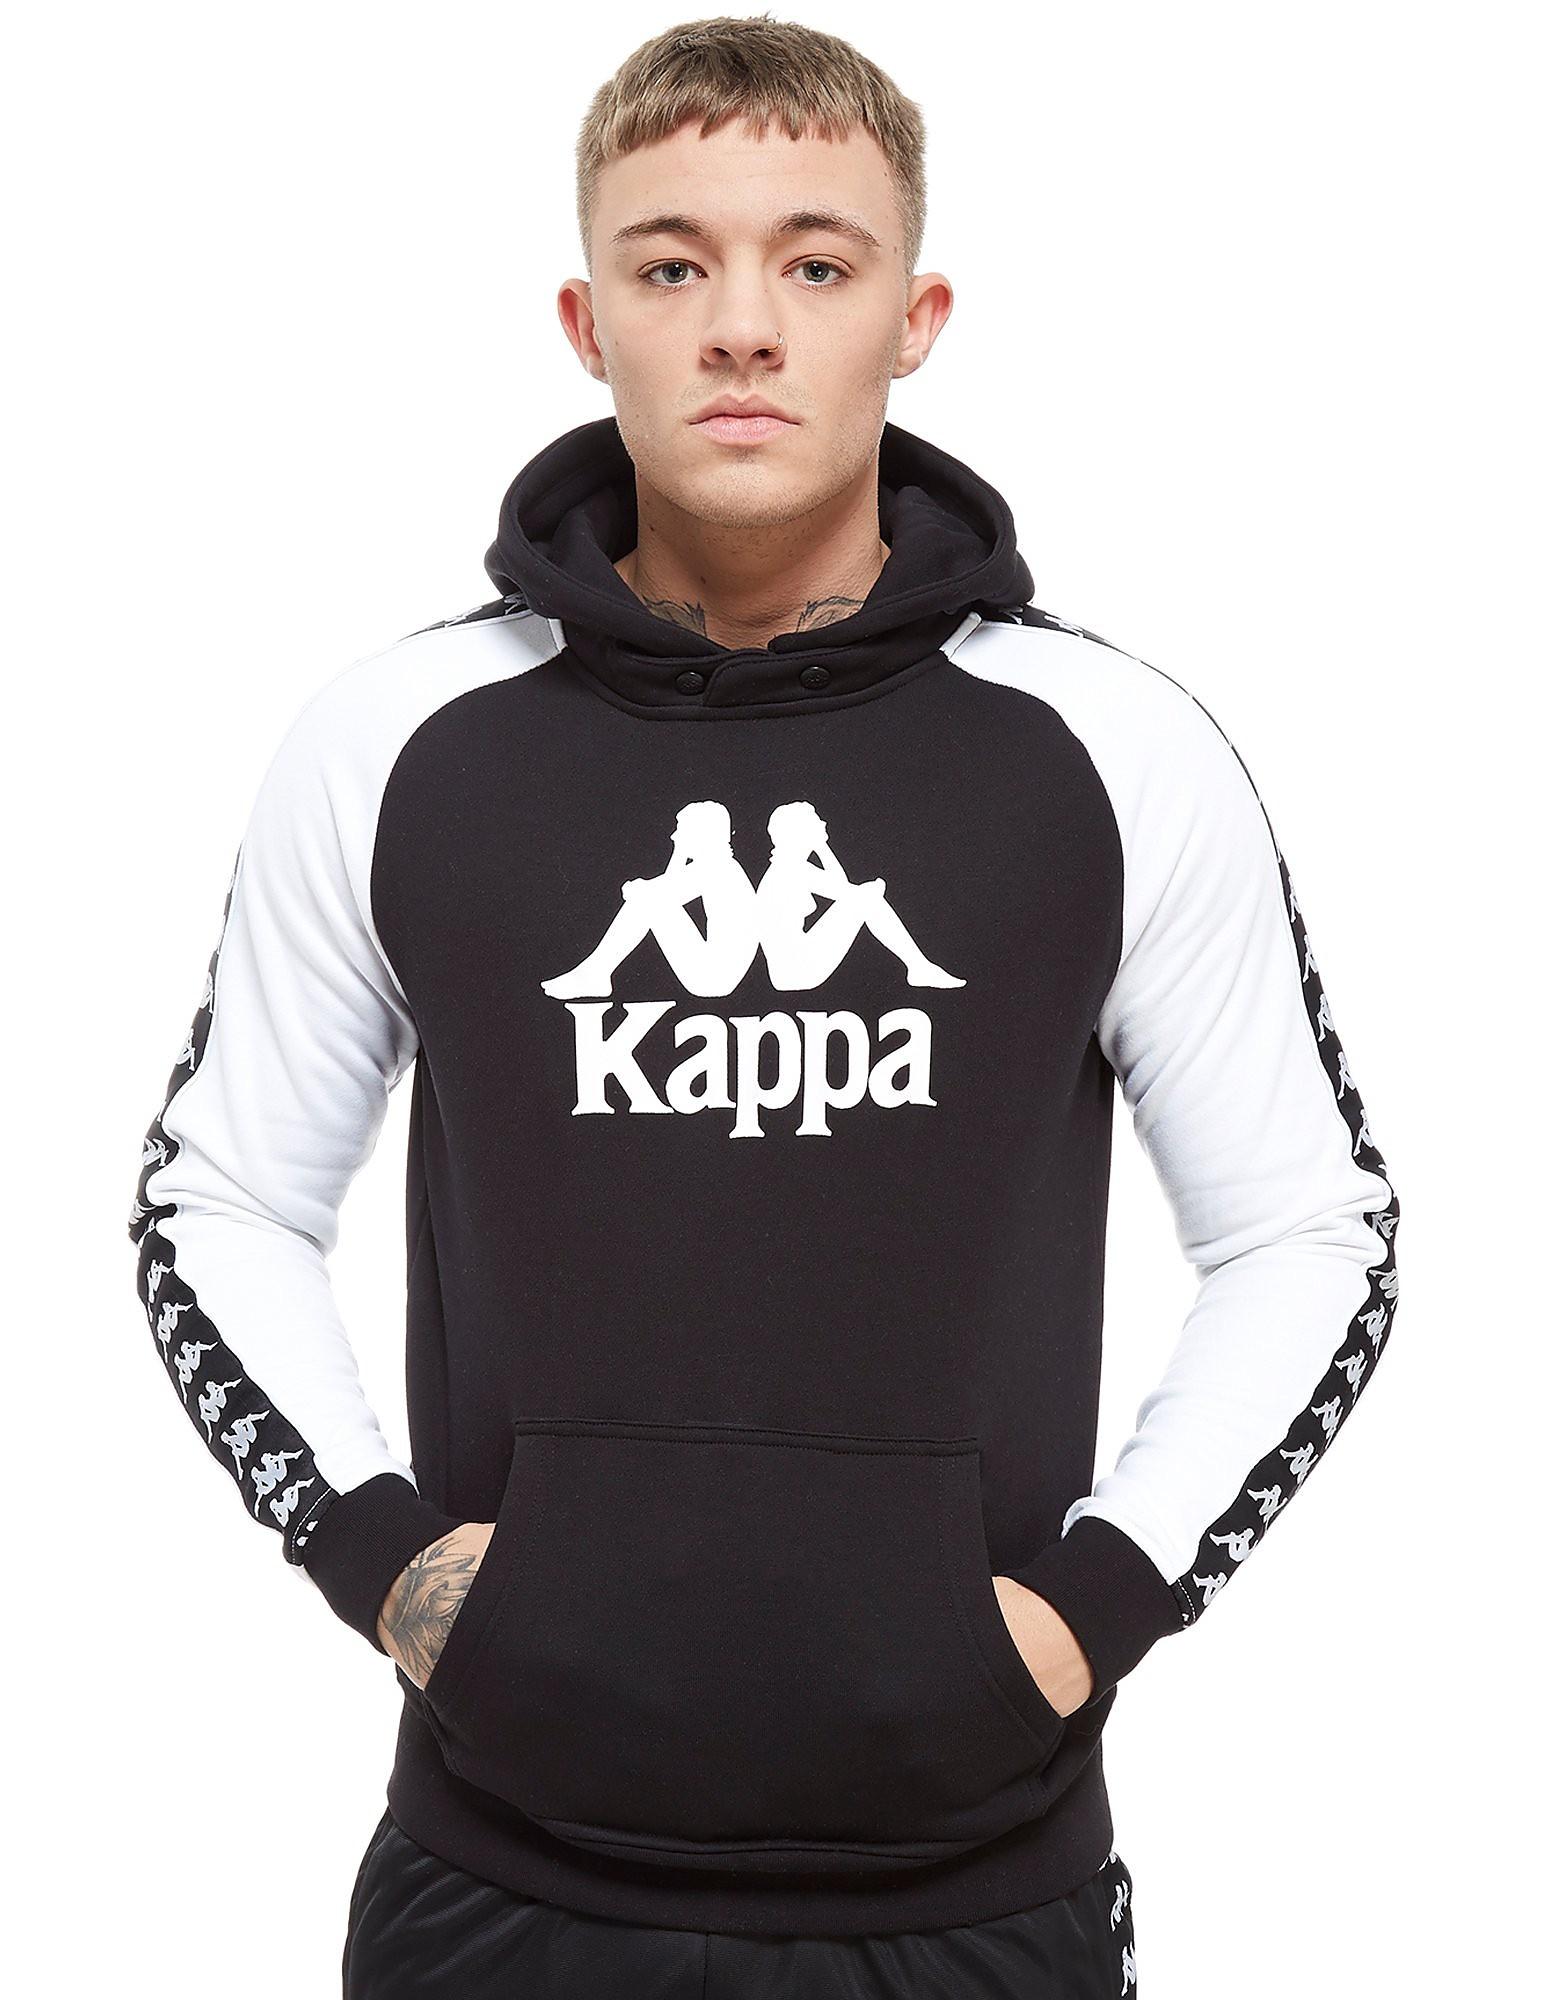 Kappa sudadera con capucha Iggipop